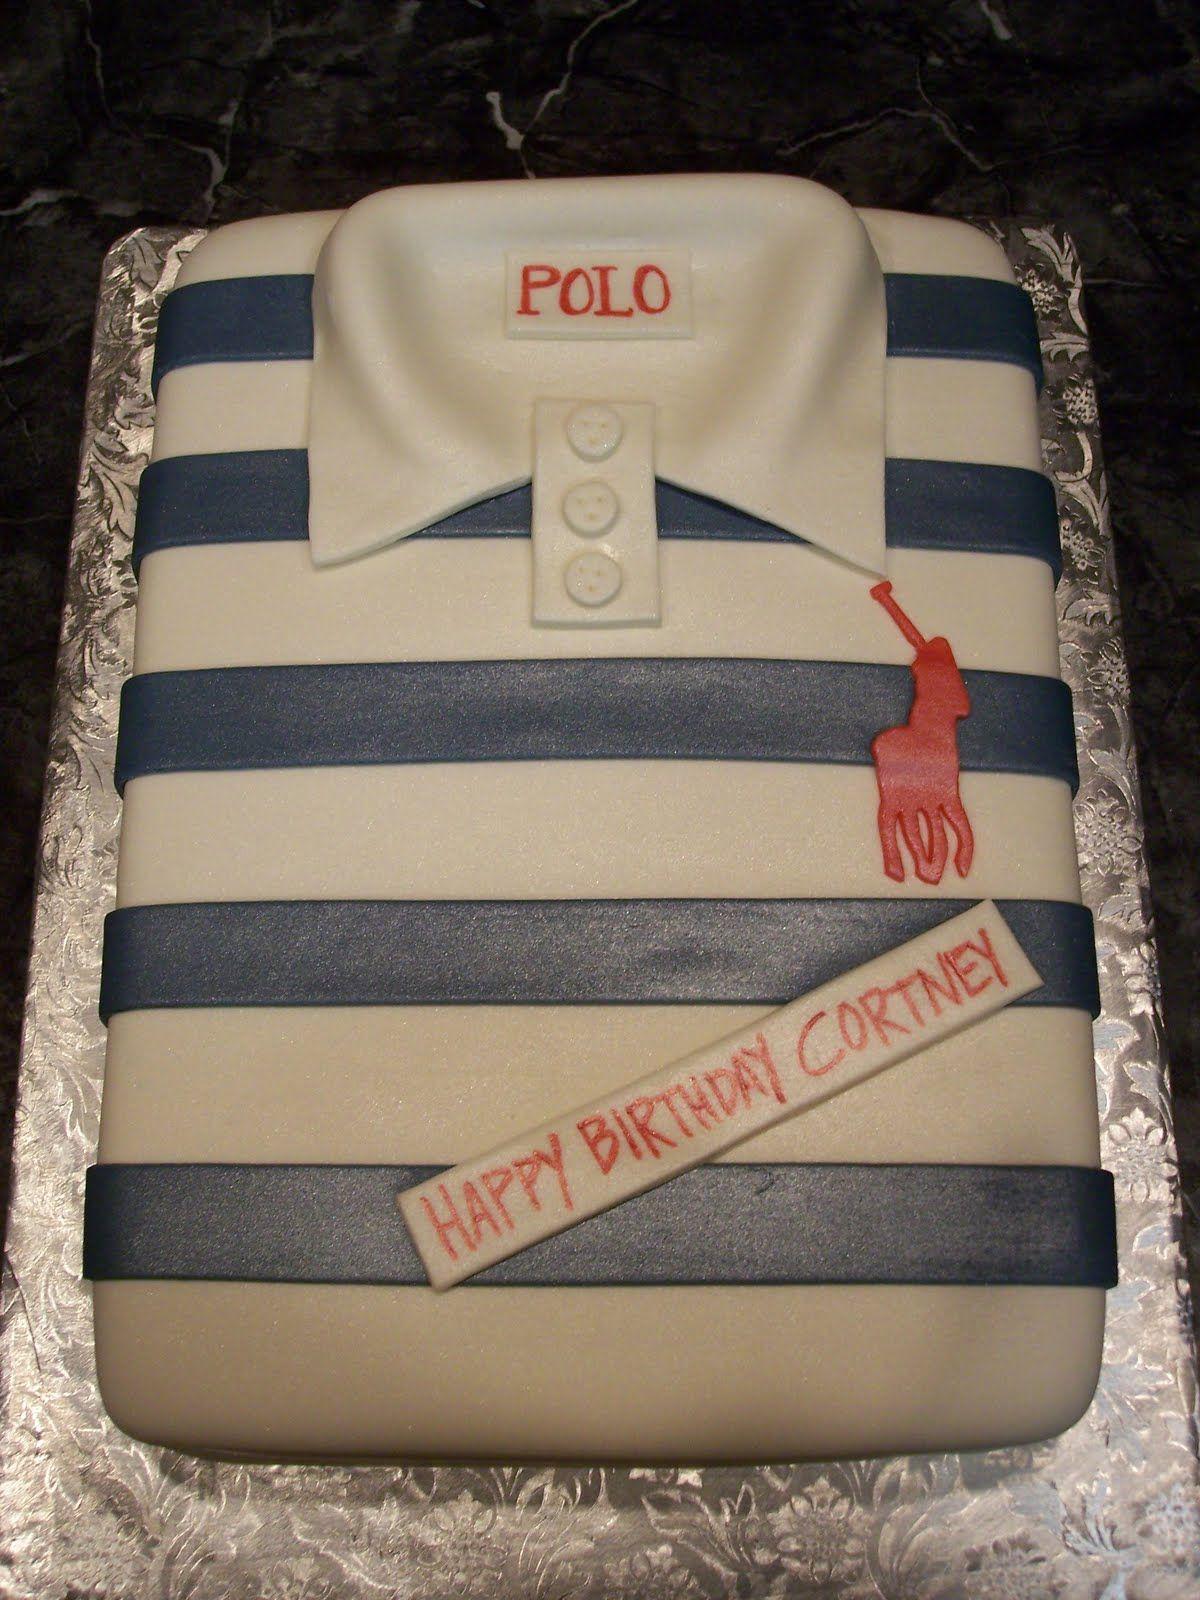 Shirt Cakes MoniCakes Polo Shirt Cake Fathers Day Cake - Birthday cake shirt